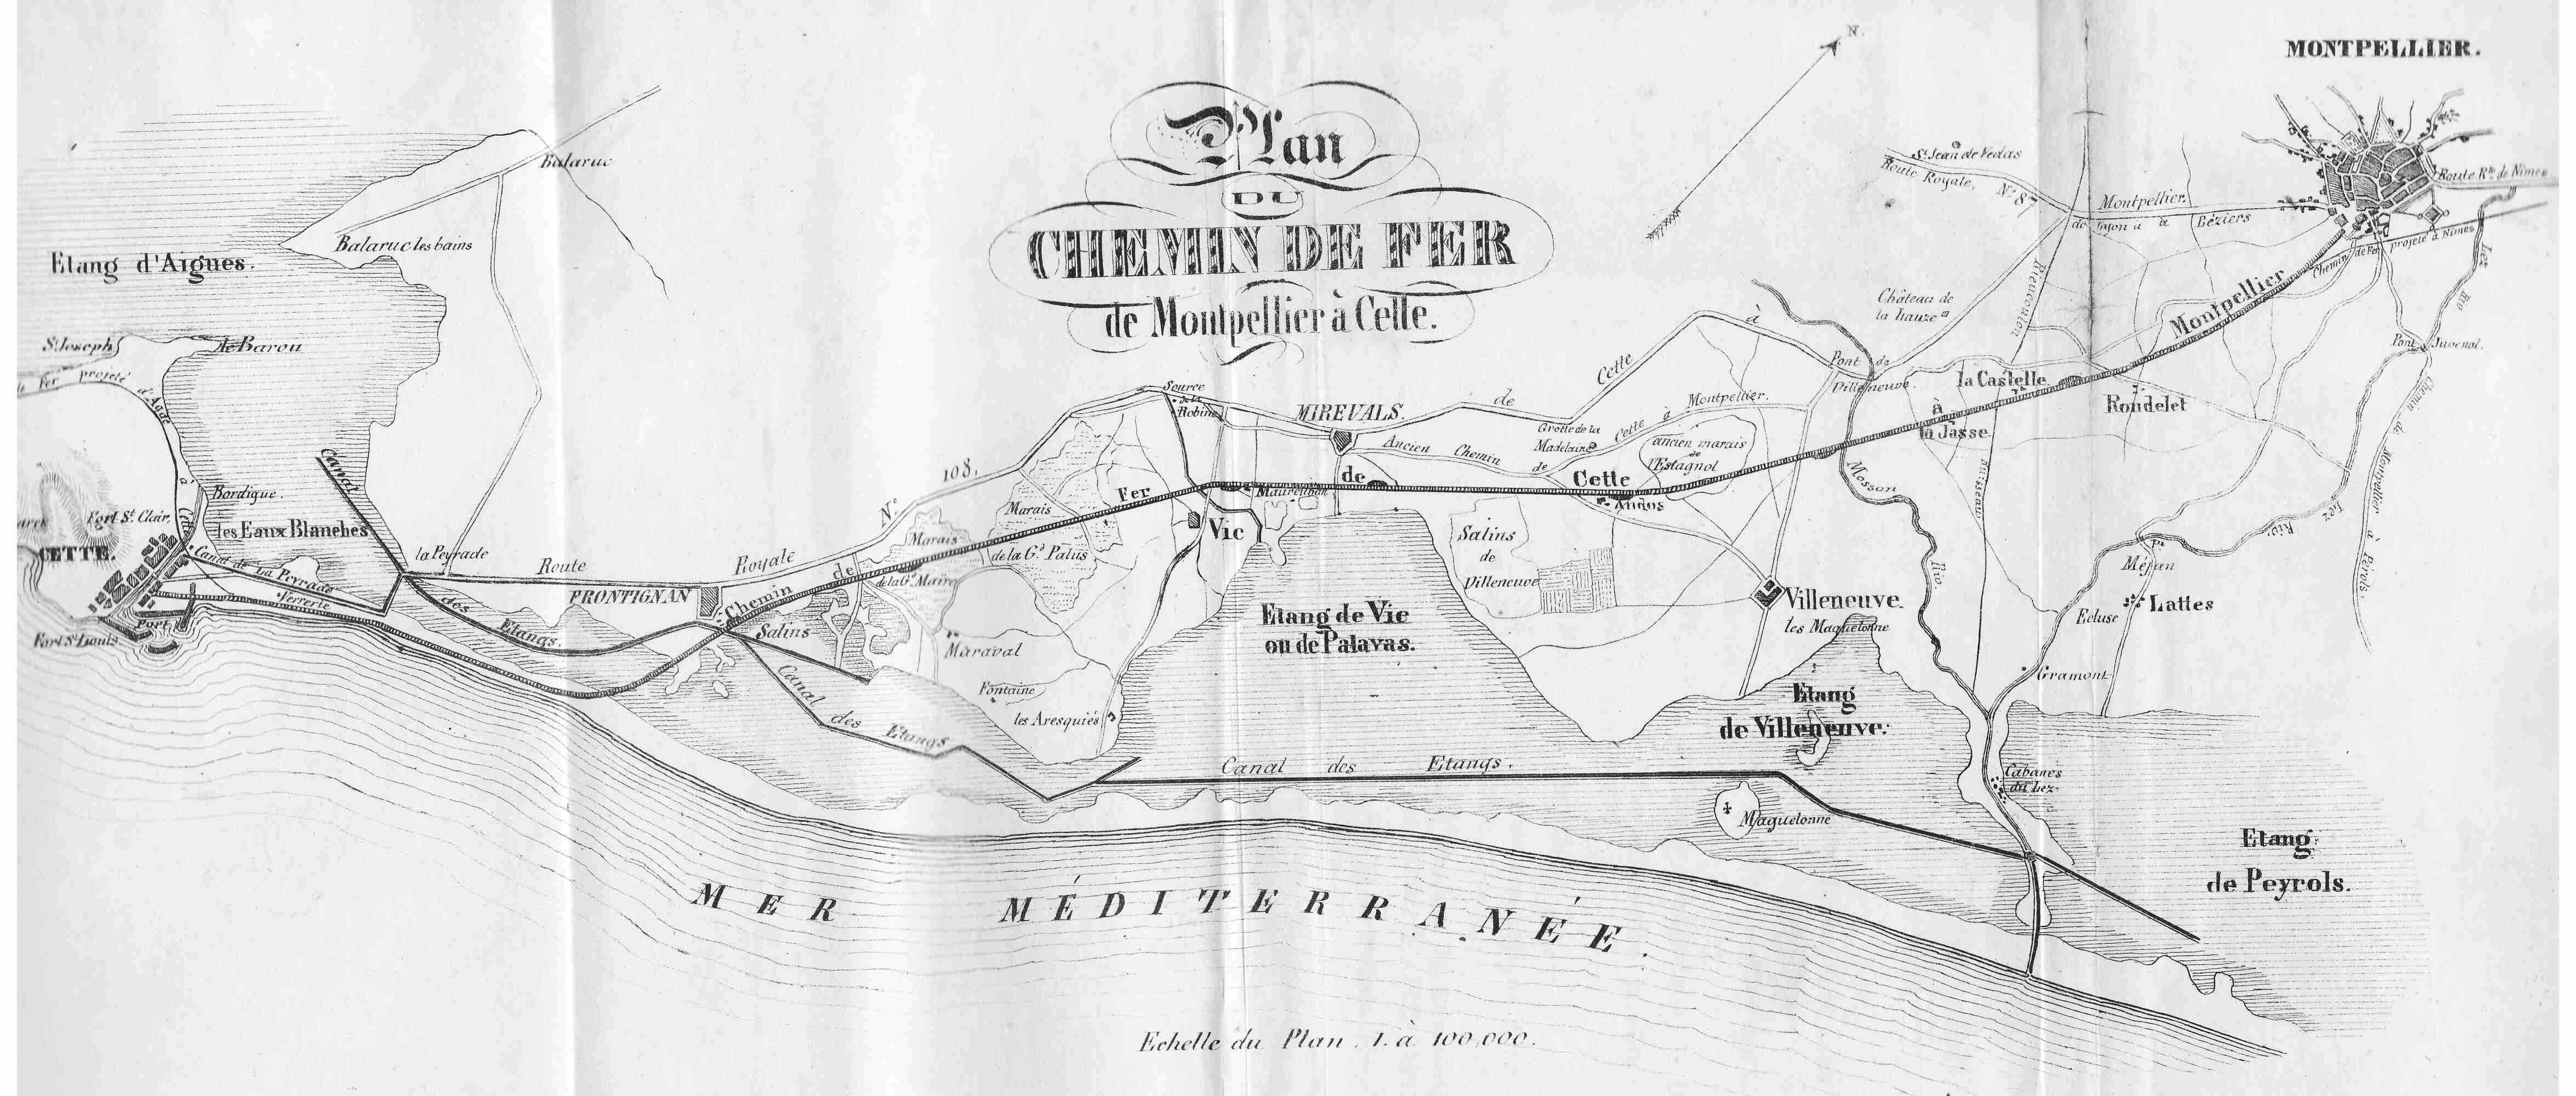 carte chemin de fer File:Carte du chemin de fer Montpellier Cette.   Wikimedia Commons